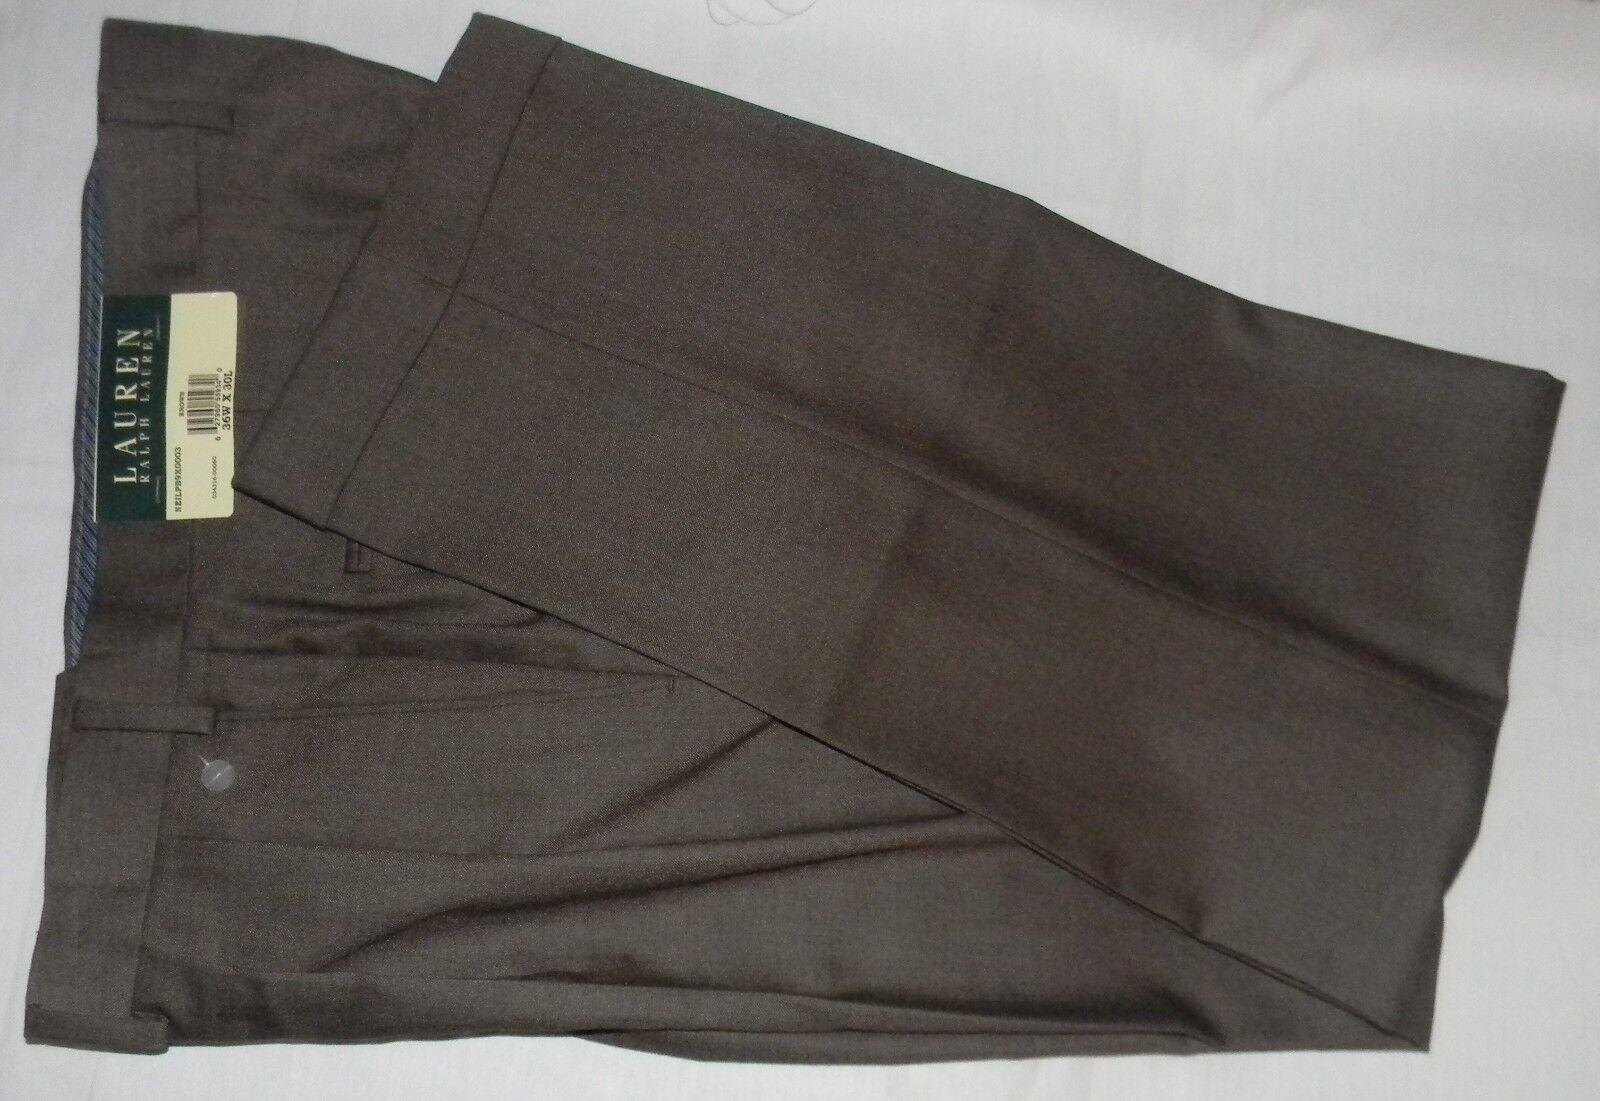 NEW LAUREN Ralph Lauren Pleated 36x30 Brown Dress Pants Polyester 36W x 30L